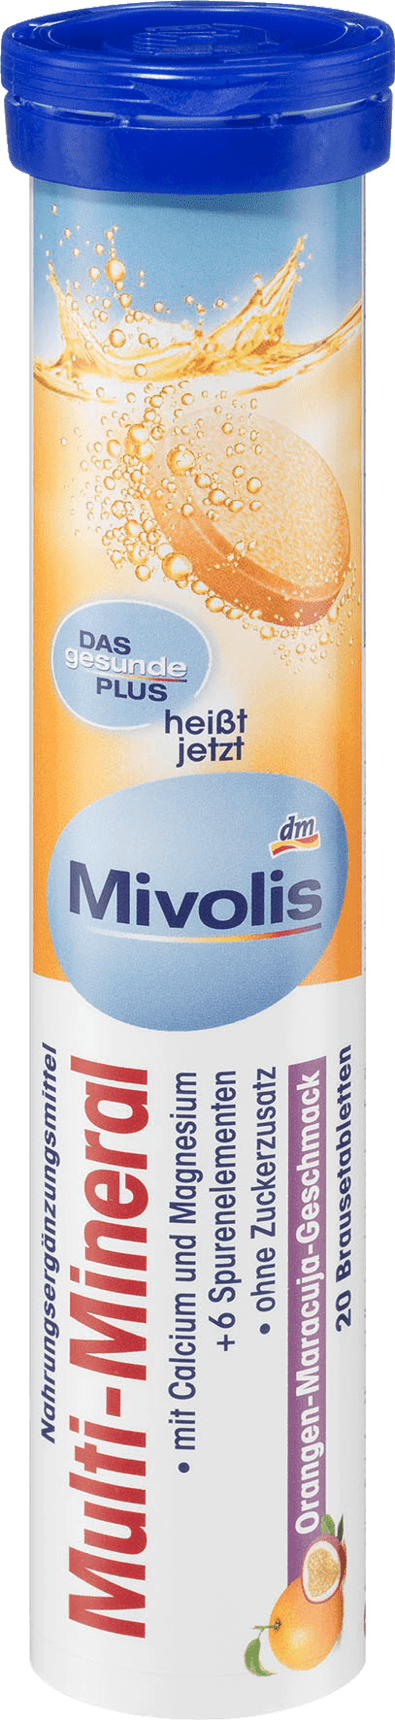 Mivolis Multi Mineral Brausetabletten 20 St 82 G Dauerhaft